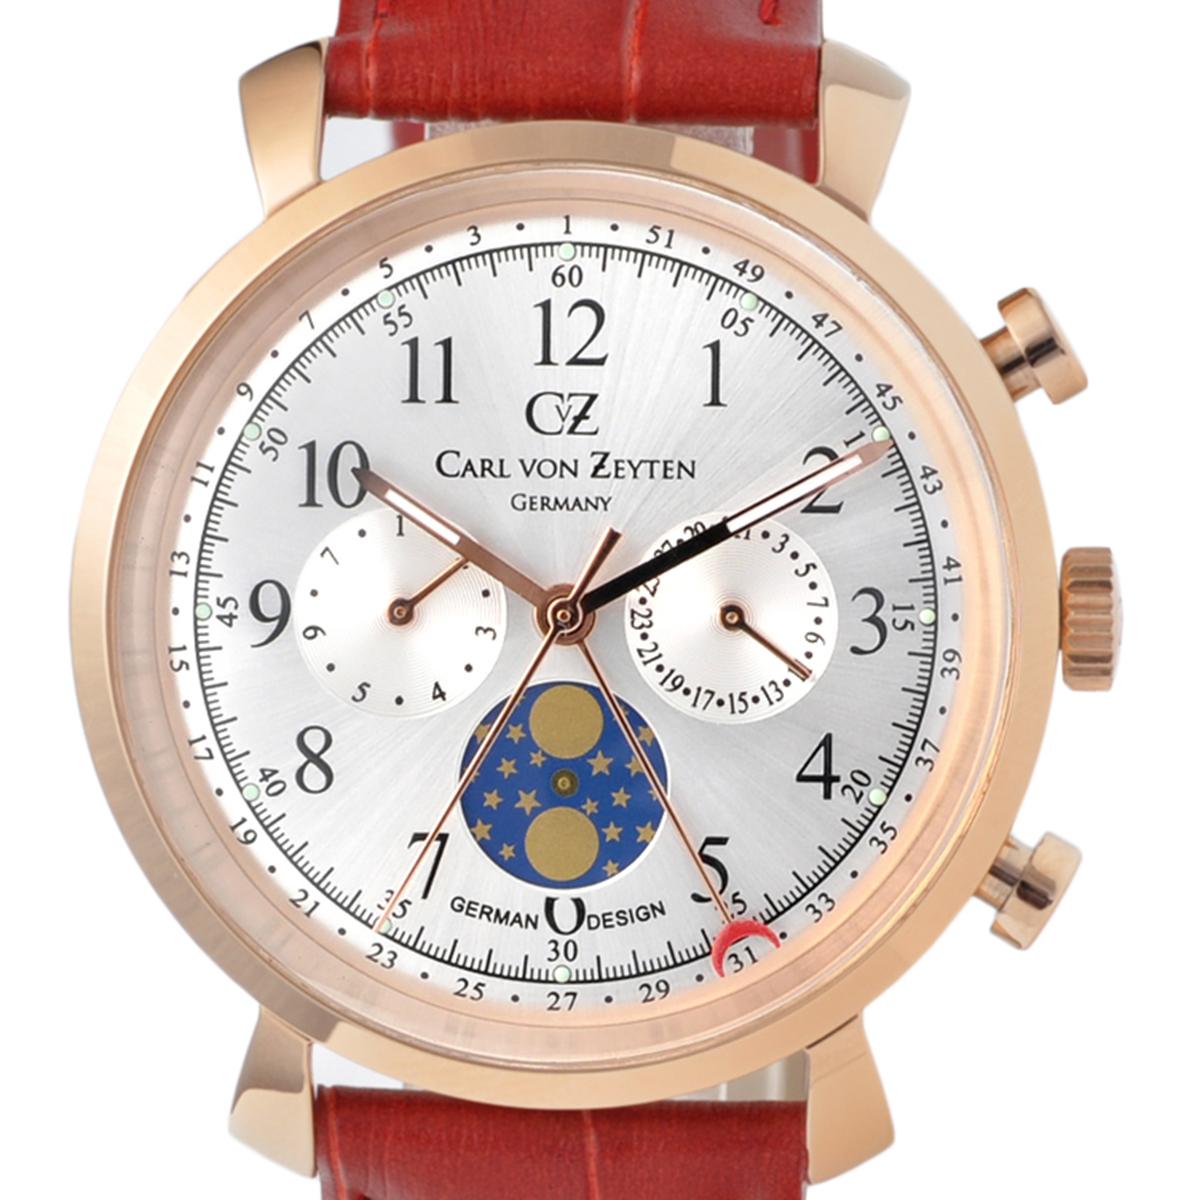 Carl von Zeyten カール・フォン・ツォイテン 電池式クォーツ 腕時計 [CvZ0015RSL] 正規品  カレンダー 月齢表示